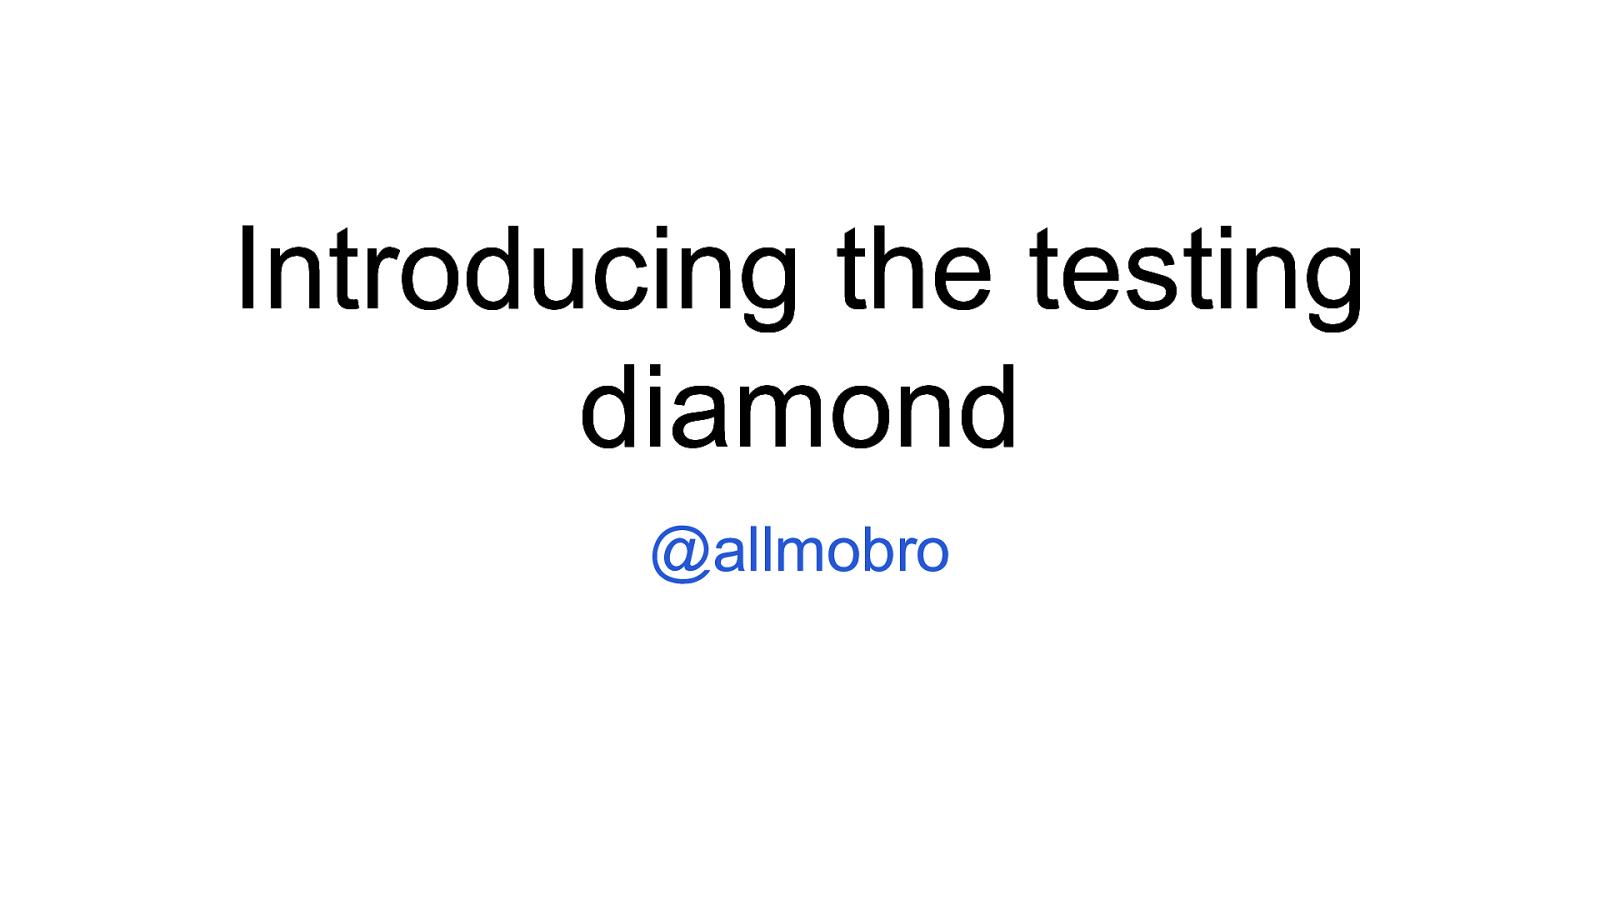 Introducing the testing diamond